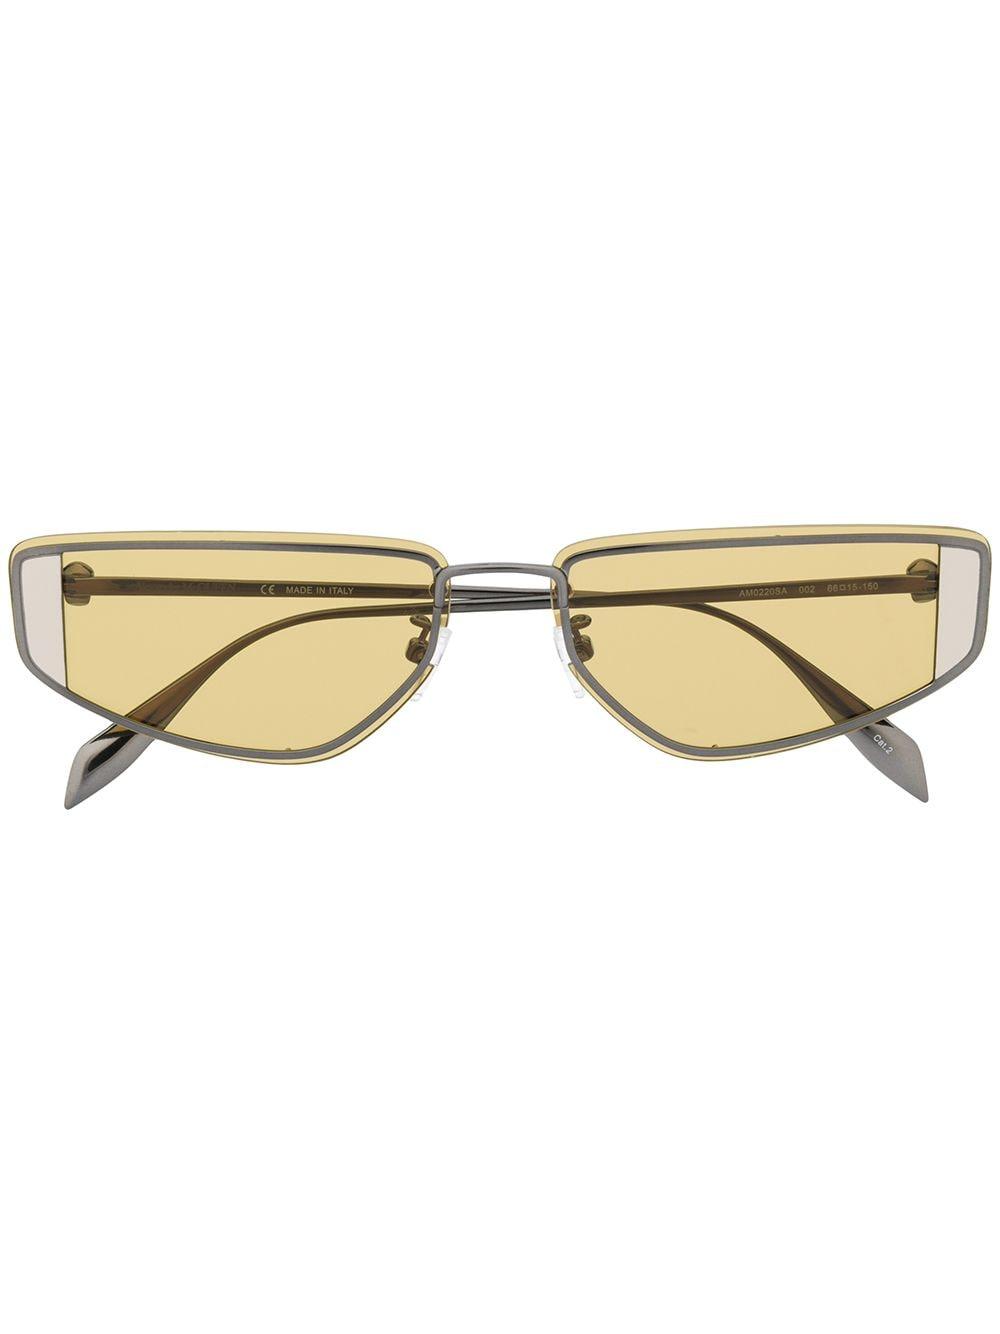 Am0220sa Sunglasses